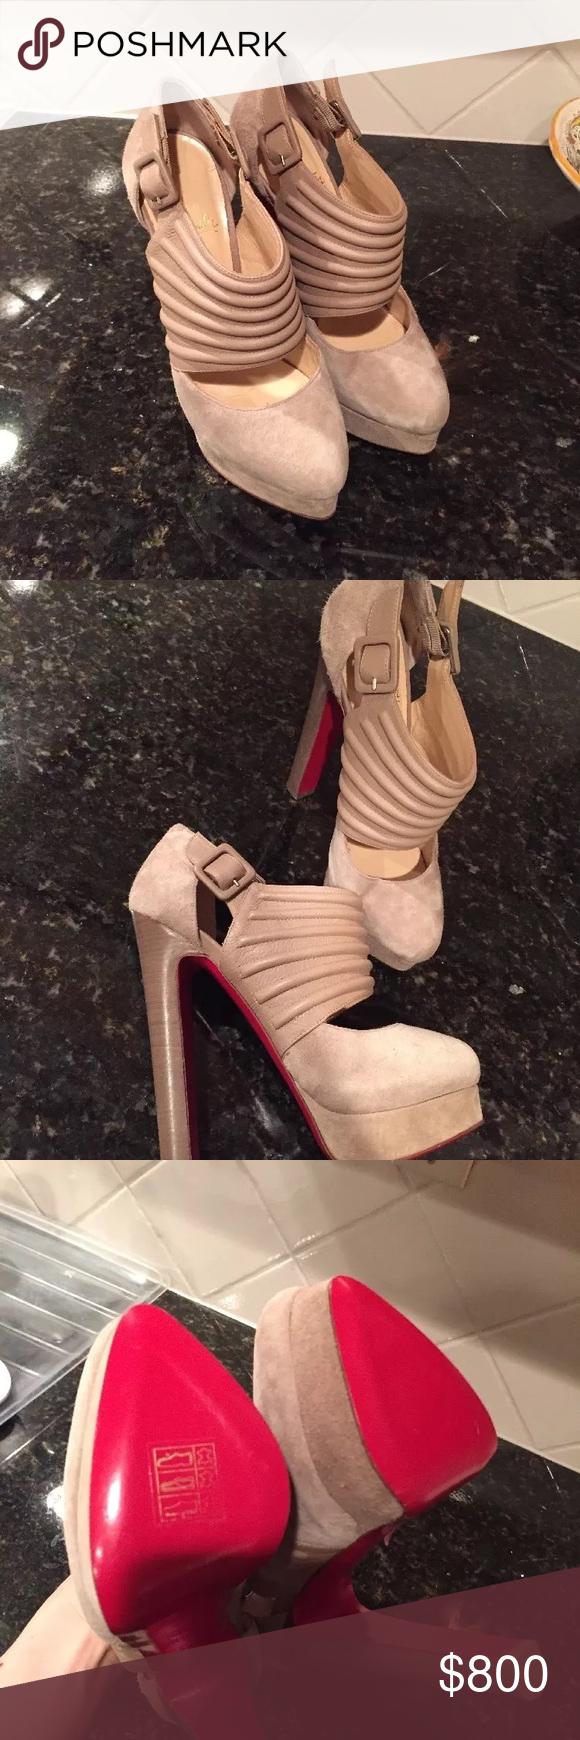 861392a590e Christian Louboutin bye bye 37.5 Brand new 37.5 nude Christian Louboutin  Shoes Heels